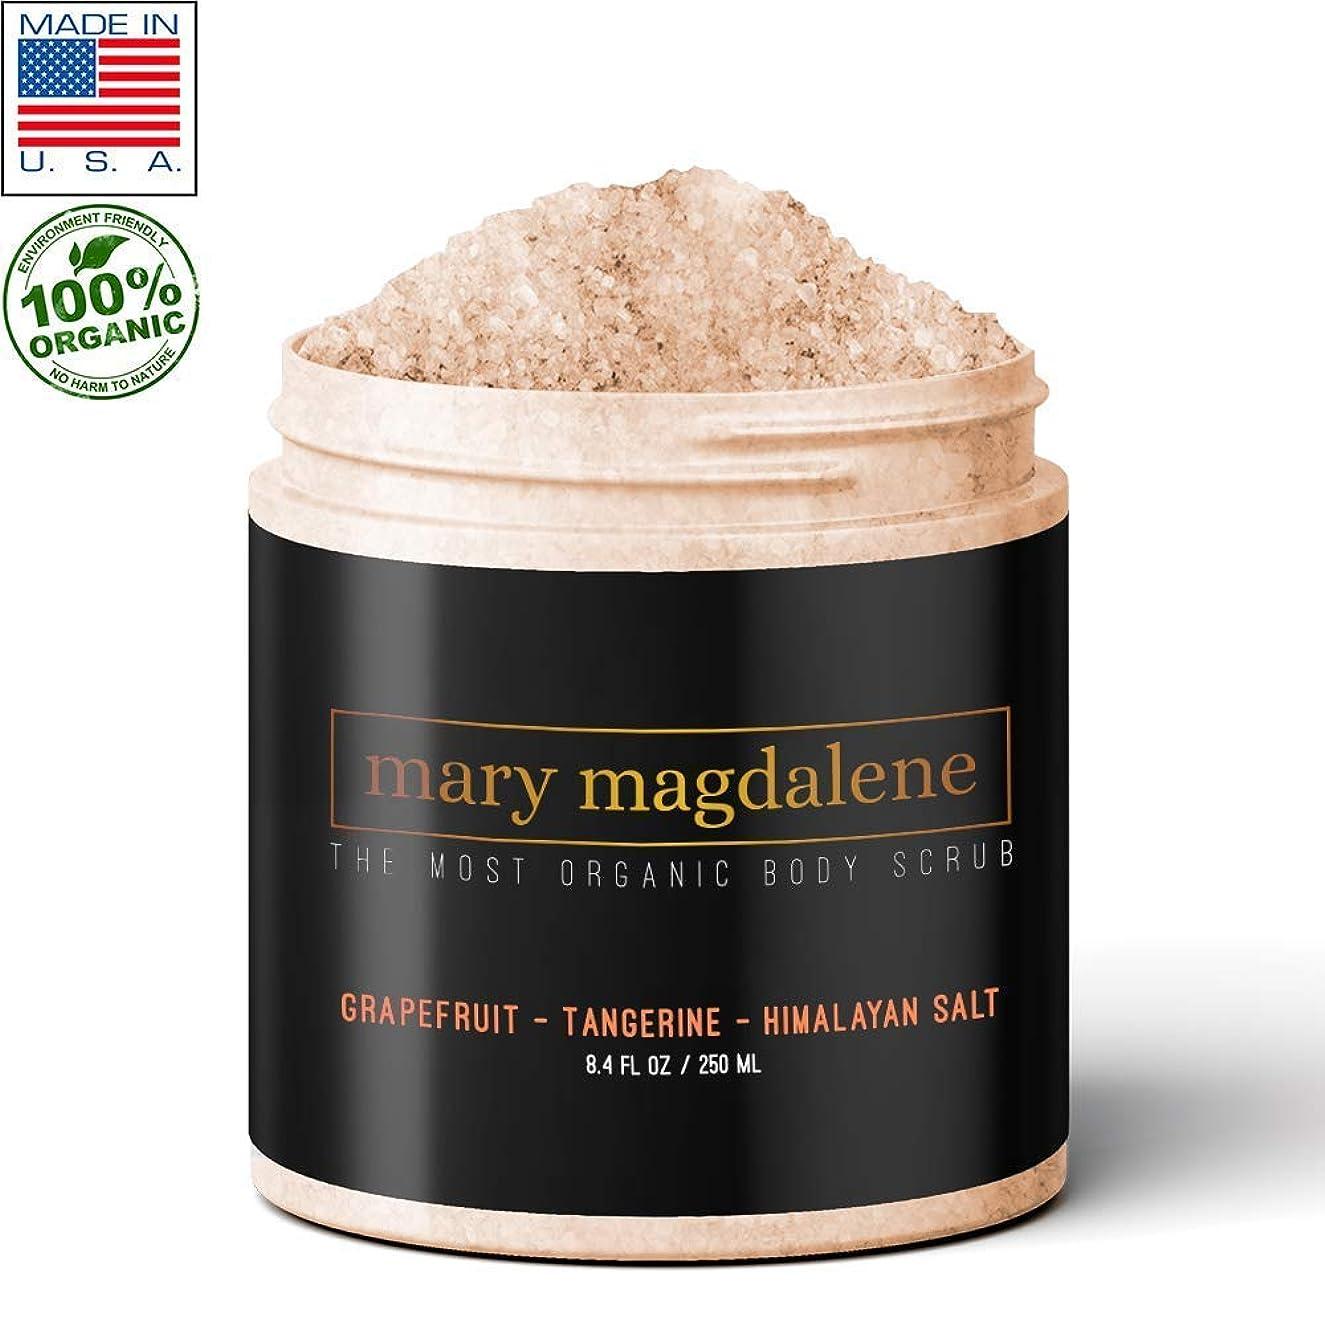 Grapefruit, Tangerine and Himalayan Salt Body Scrub. The Most Organic Body Scrub 8.4 fl. oz / 250 ml